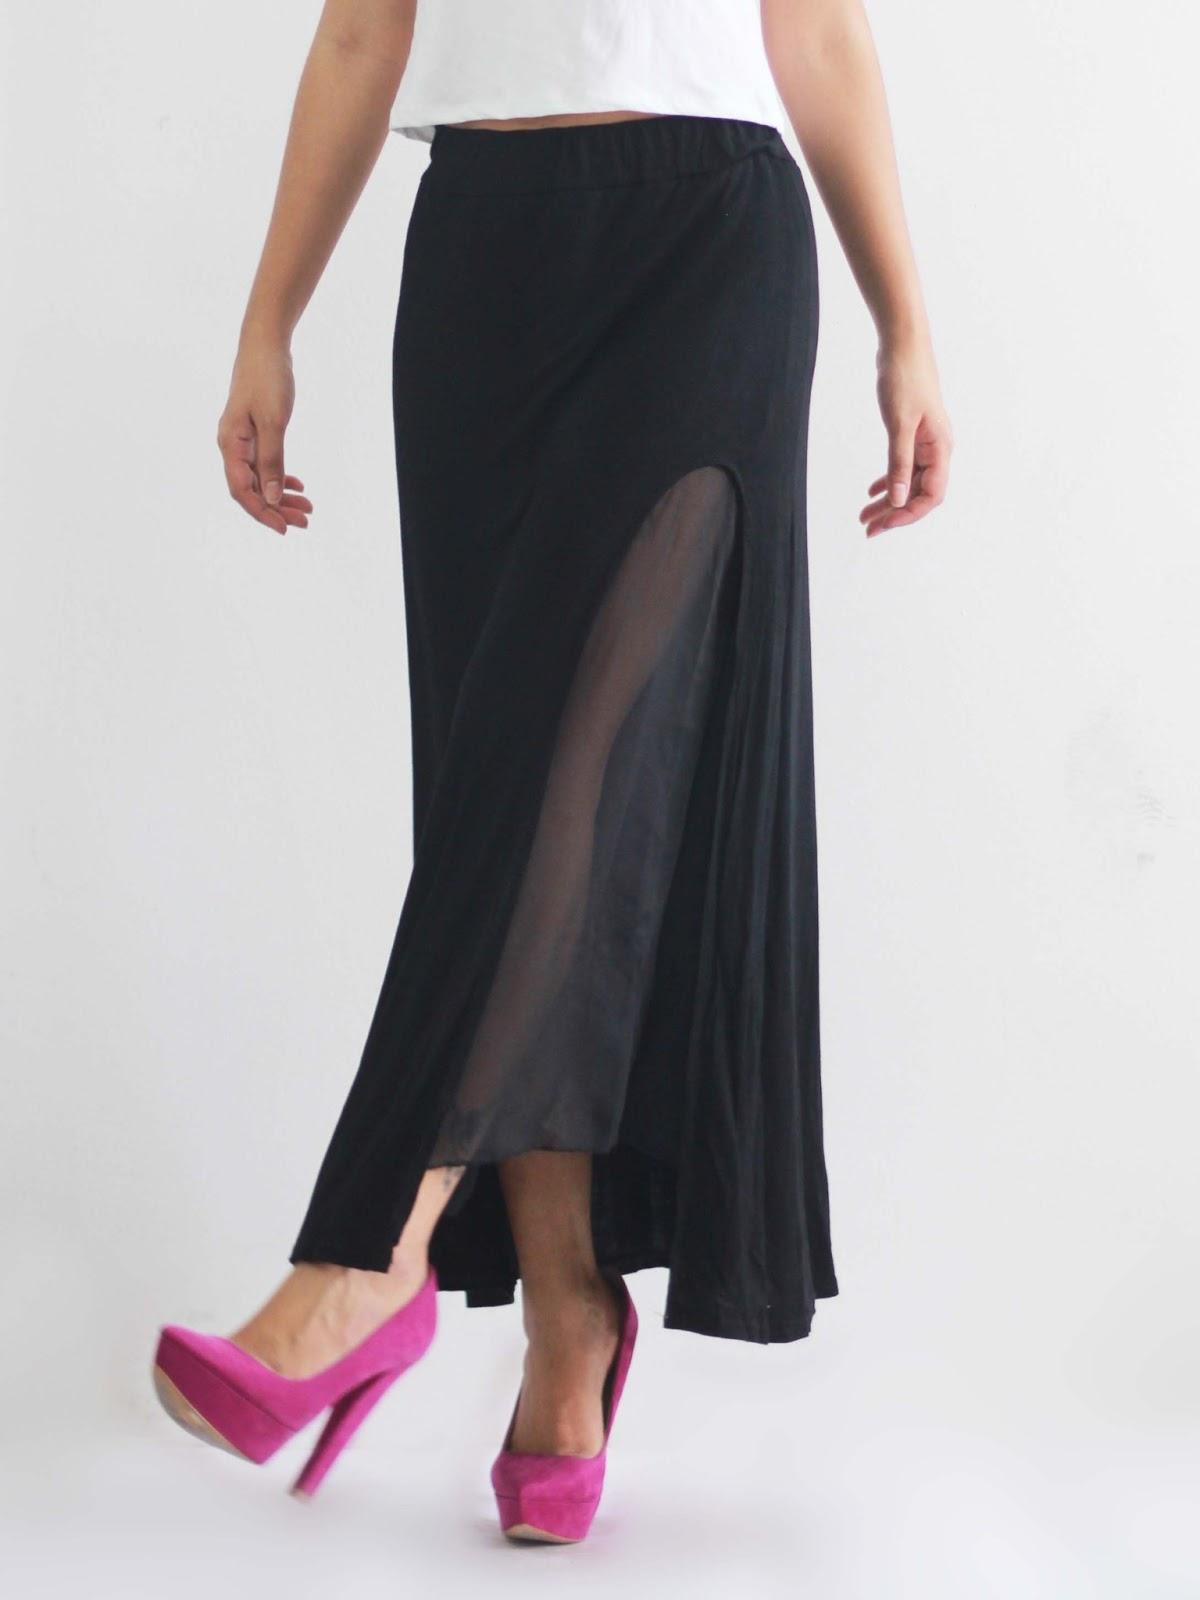 mango orangie high slit maxi skirt with chiffon lining